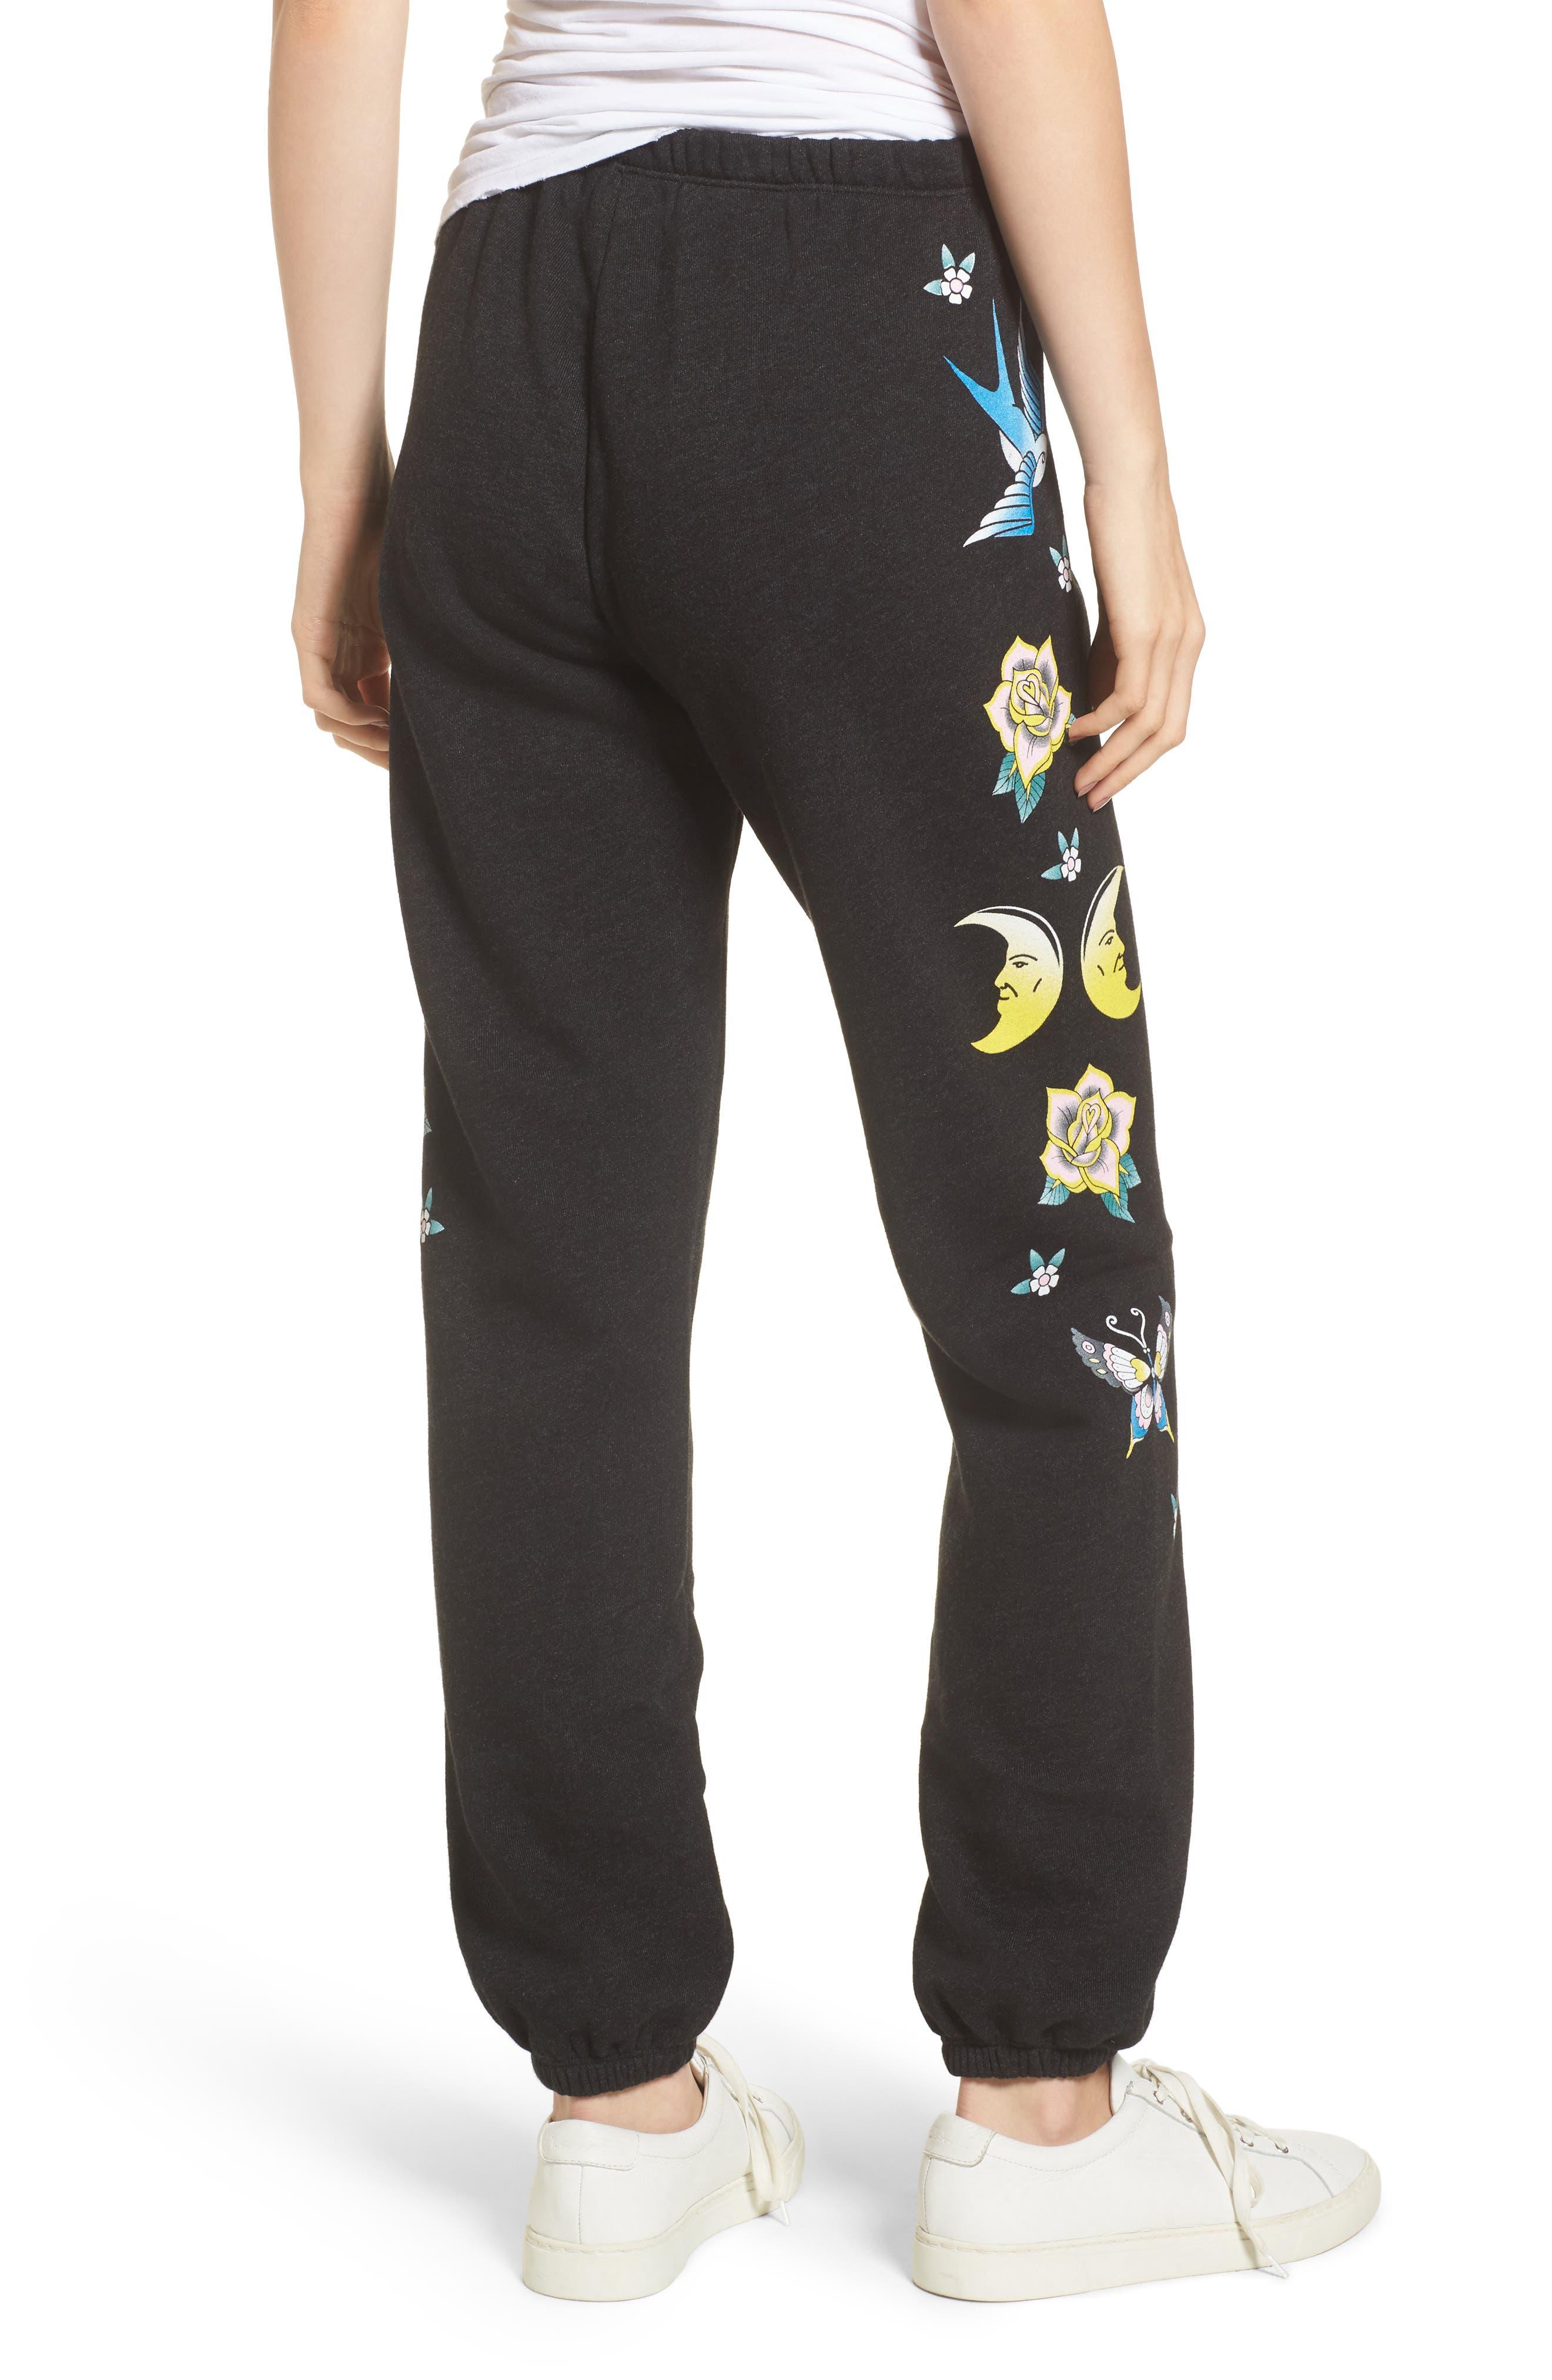 Flash Sweatpants,                             Alternate thumbnail 2, color,                             Black